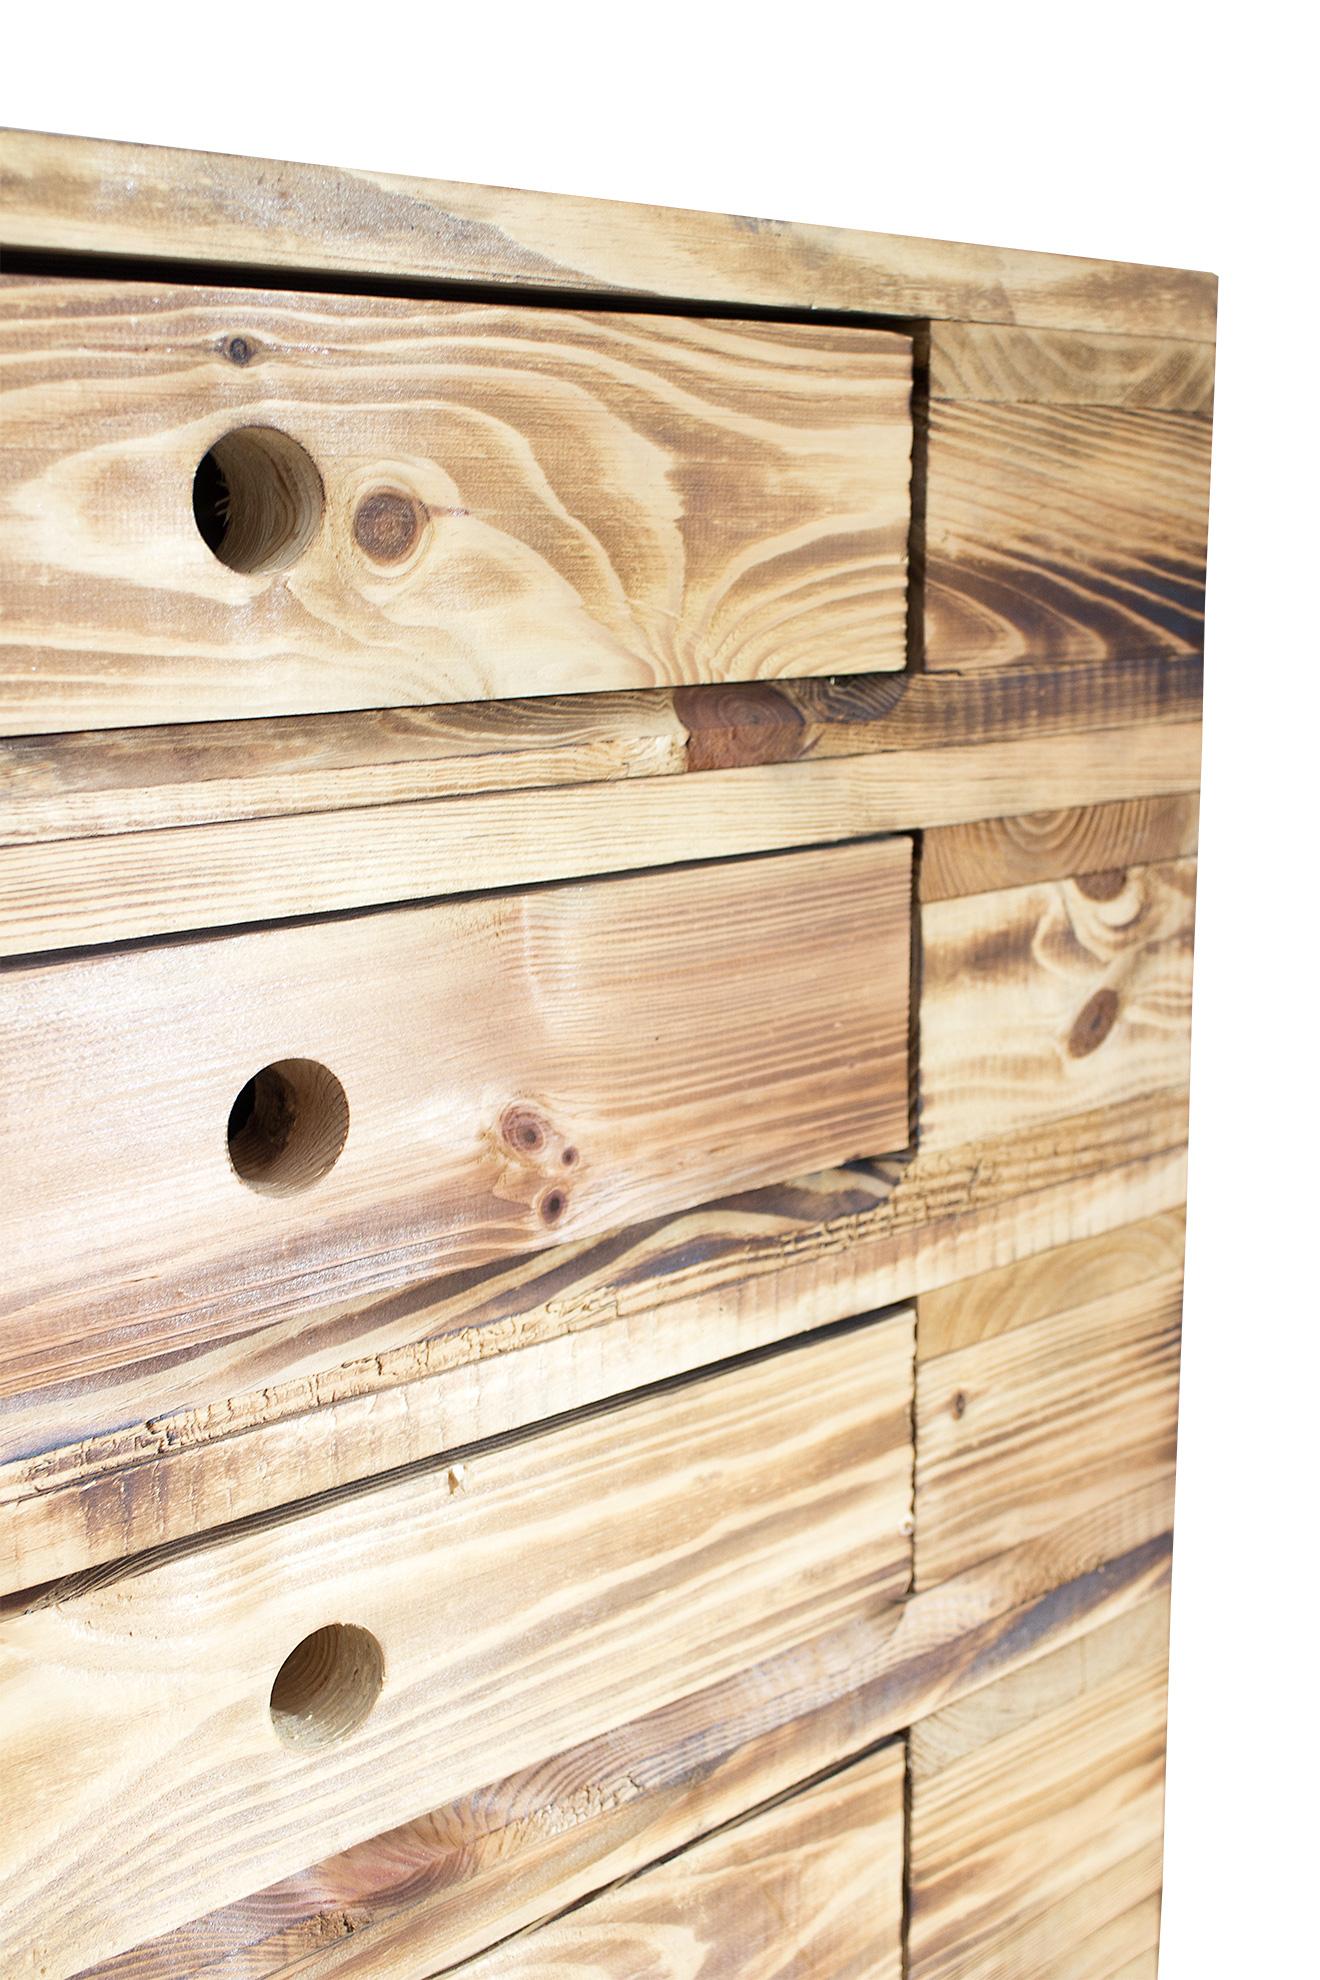 m bel aus paletten vintage kommode aus palettenholz im industrial style 120x47x72cm. Black Bedroom Furniture Sets. Home Design Ideas